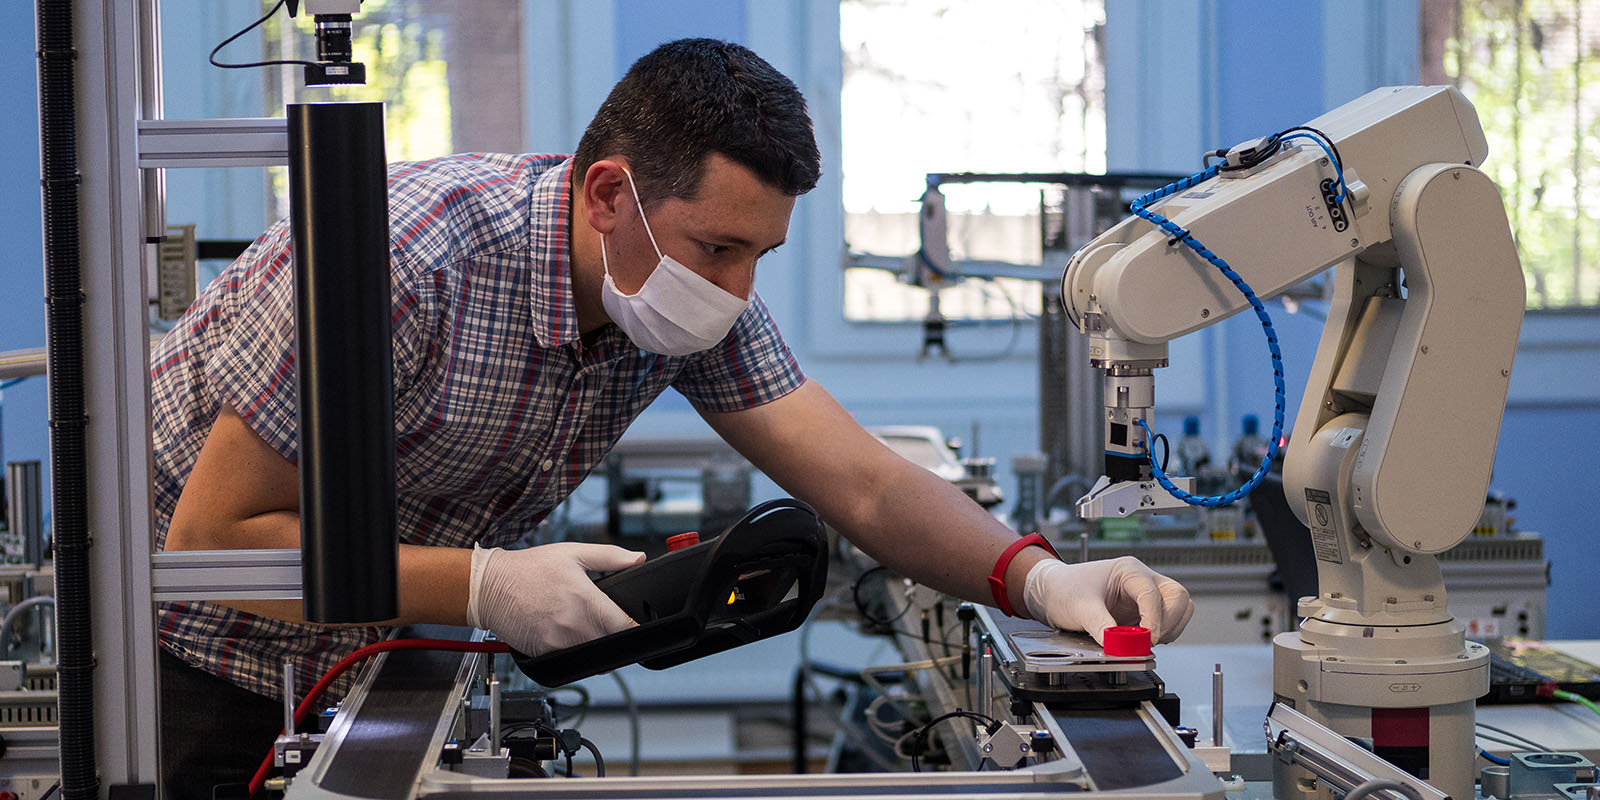 Man programming robot arm with teach pendant